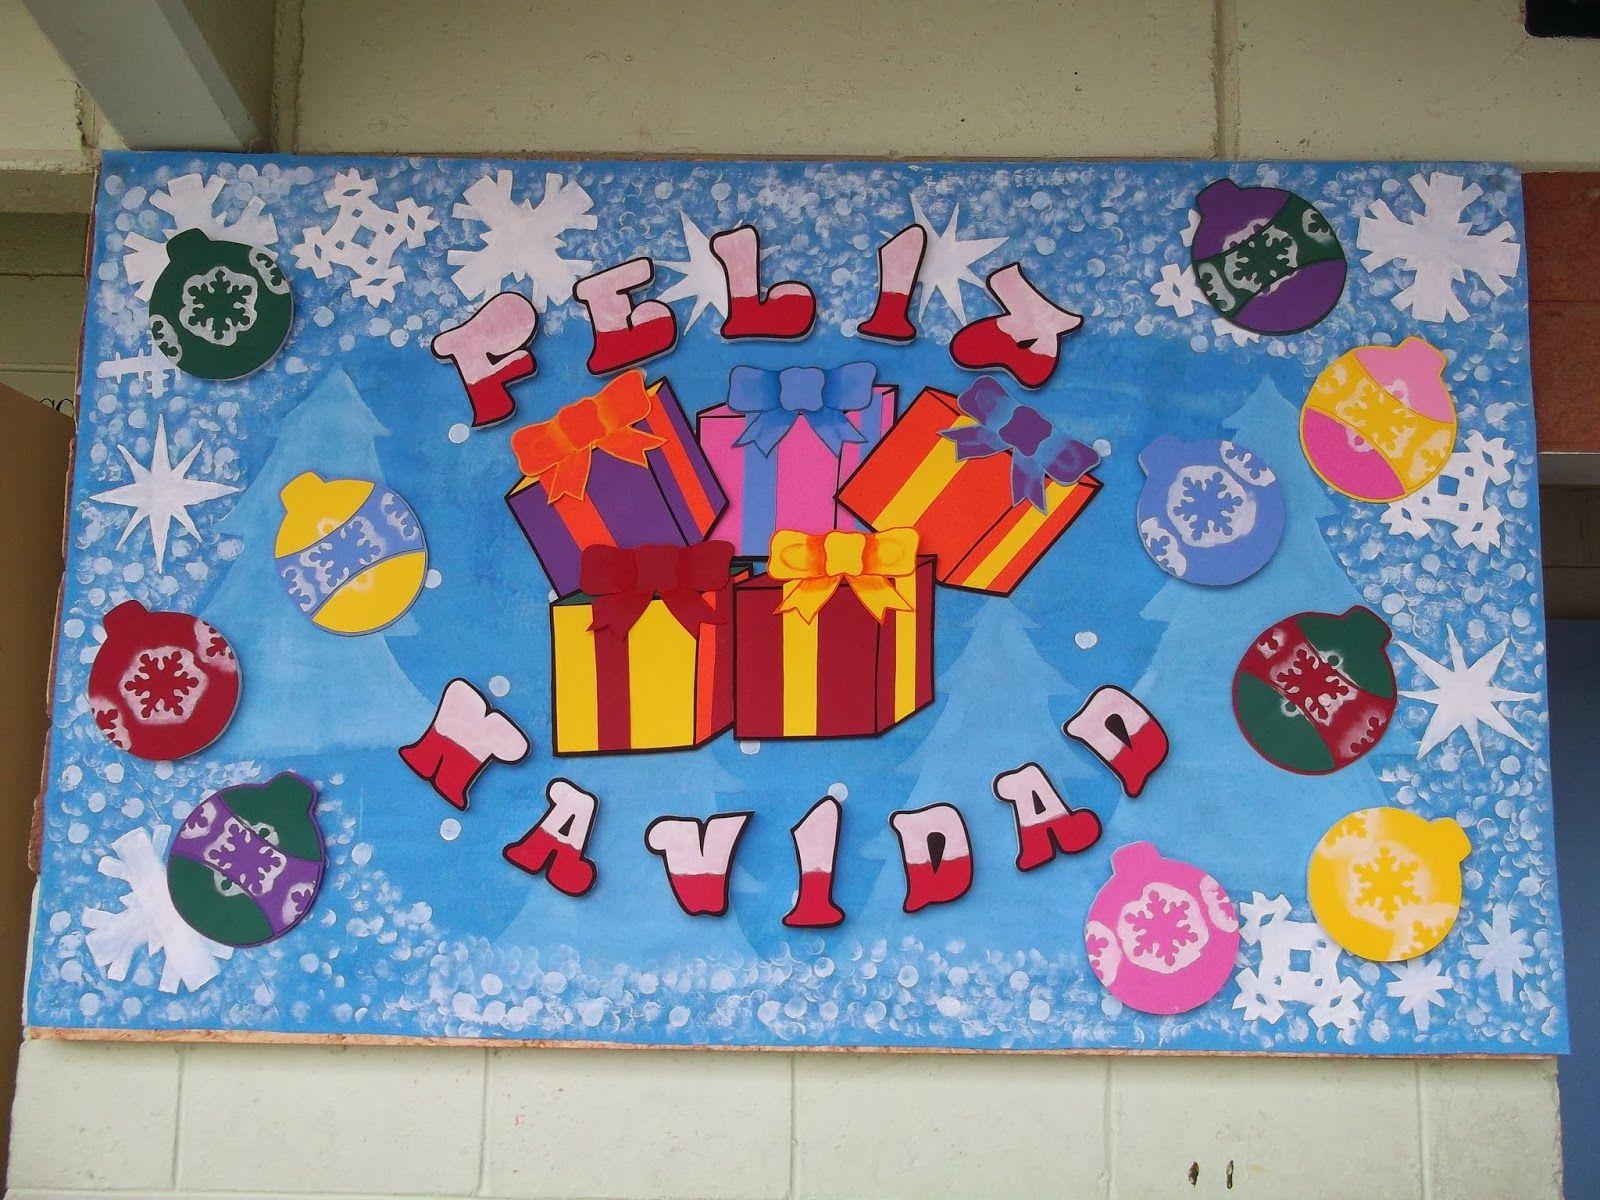 Decoraciones infantiles the teacher diciembre - Decorar con friso ...